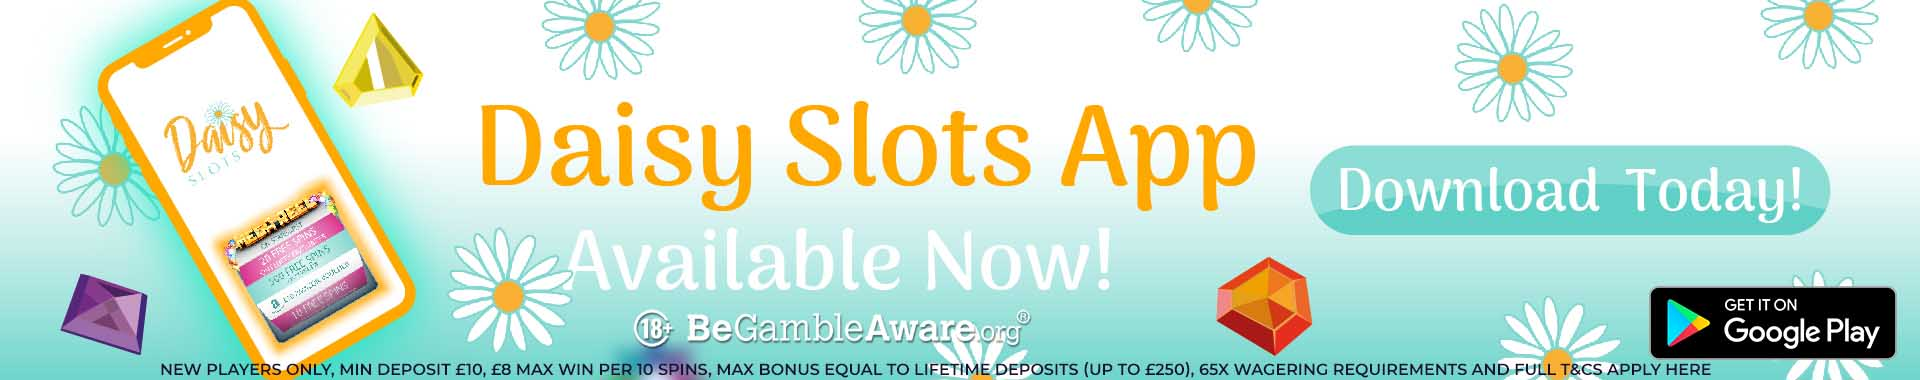 Daisy Mobile Slots App